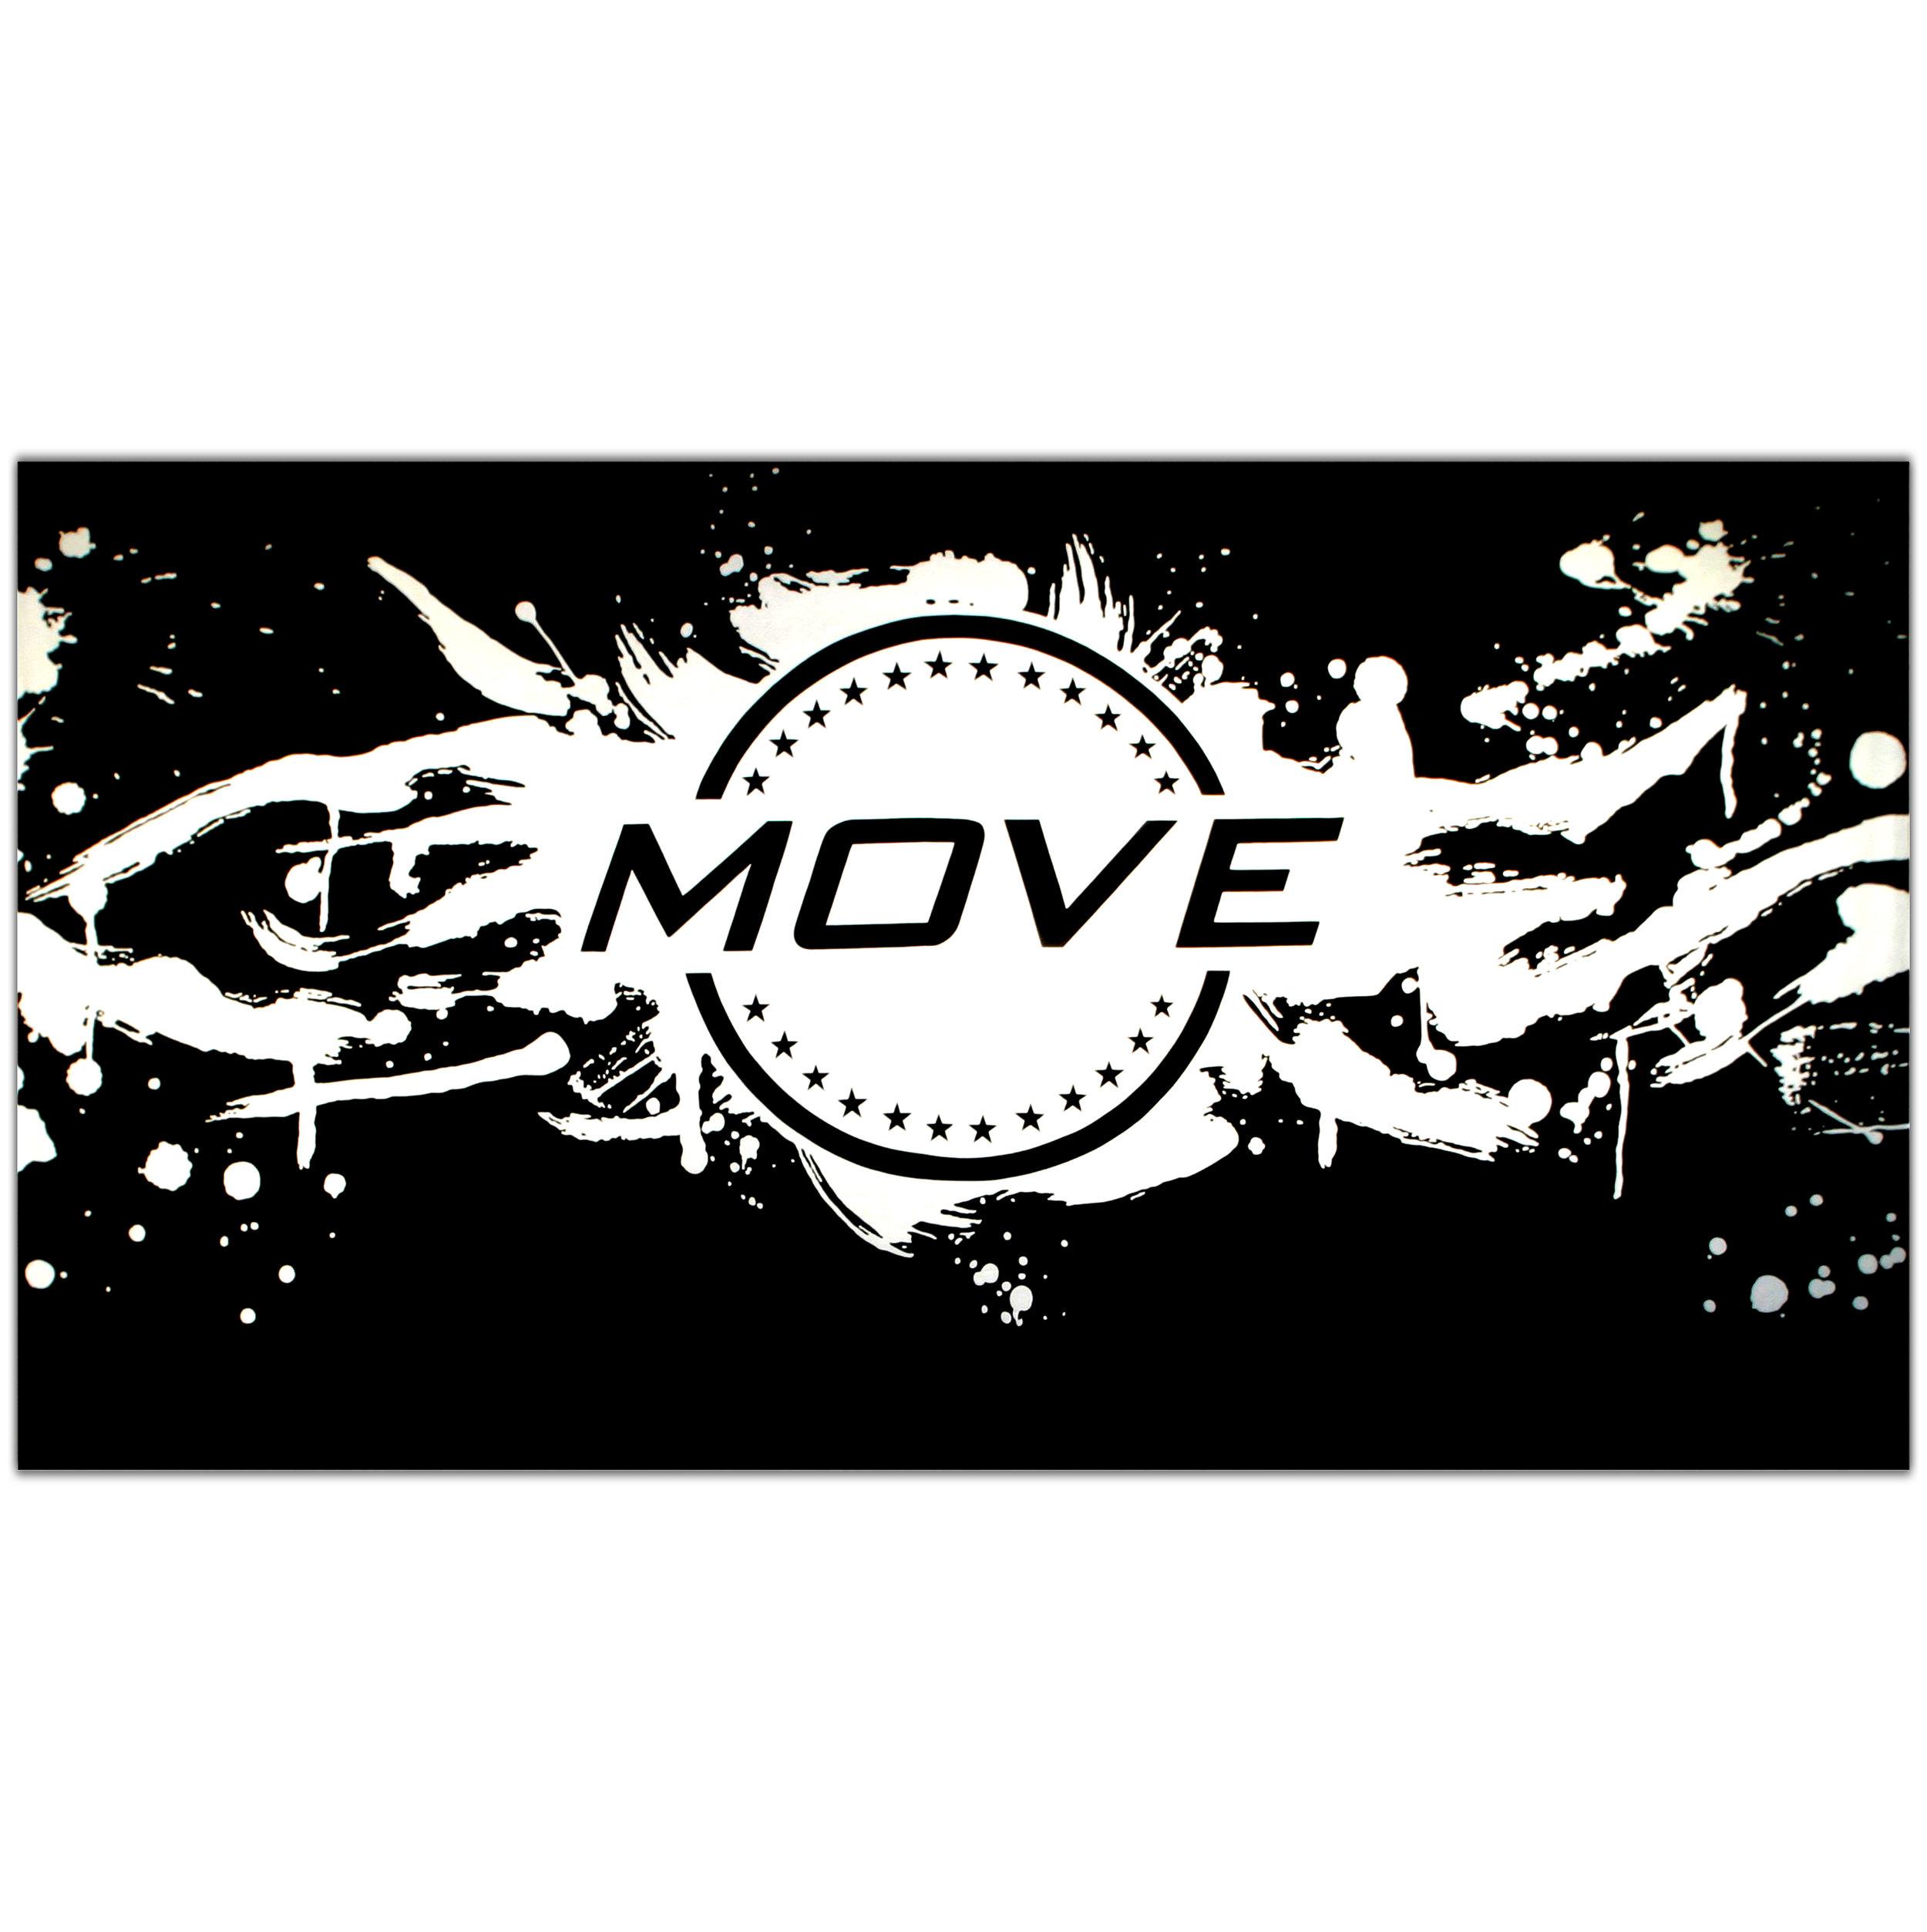 Move Drop square.jpg